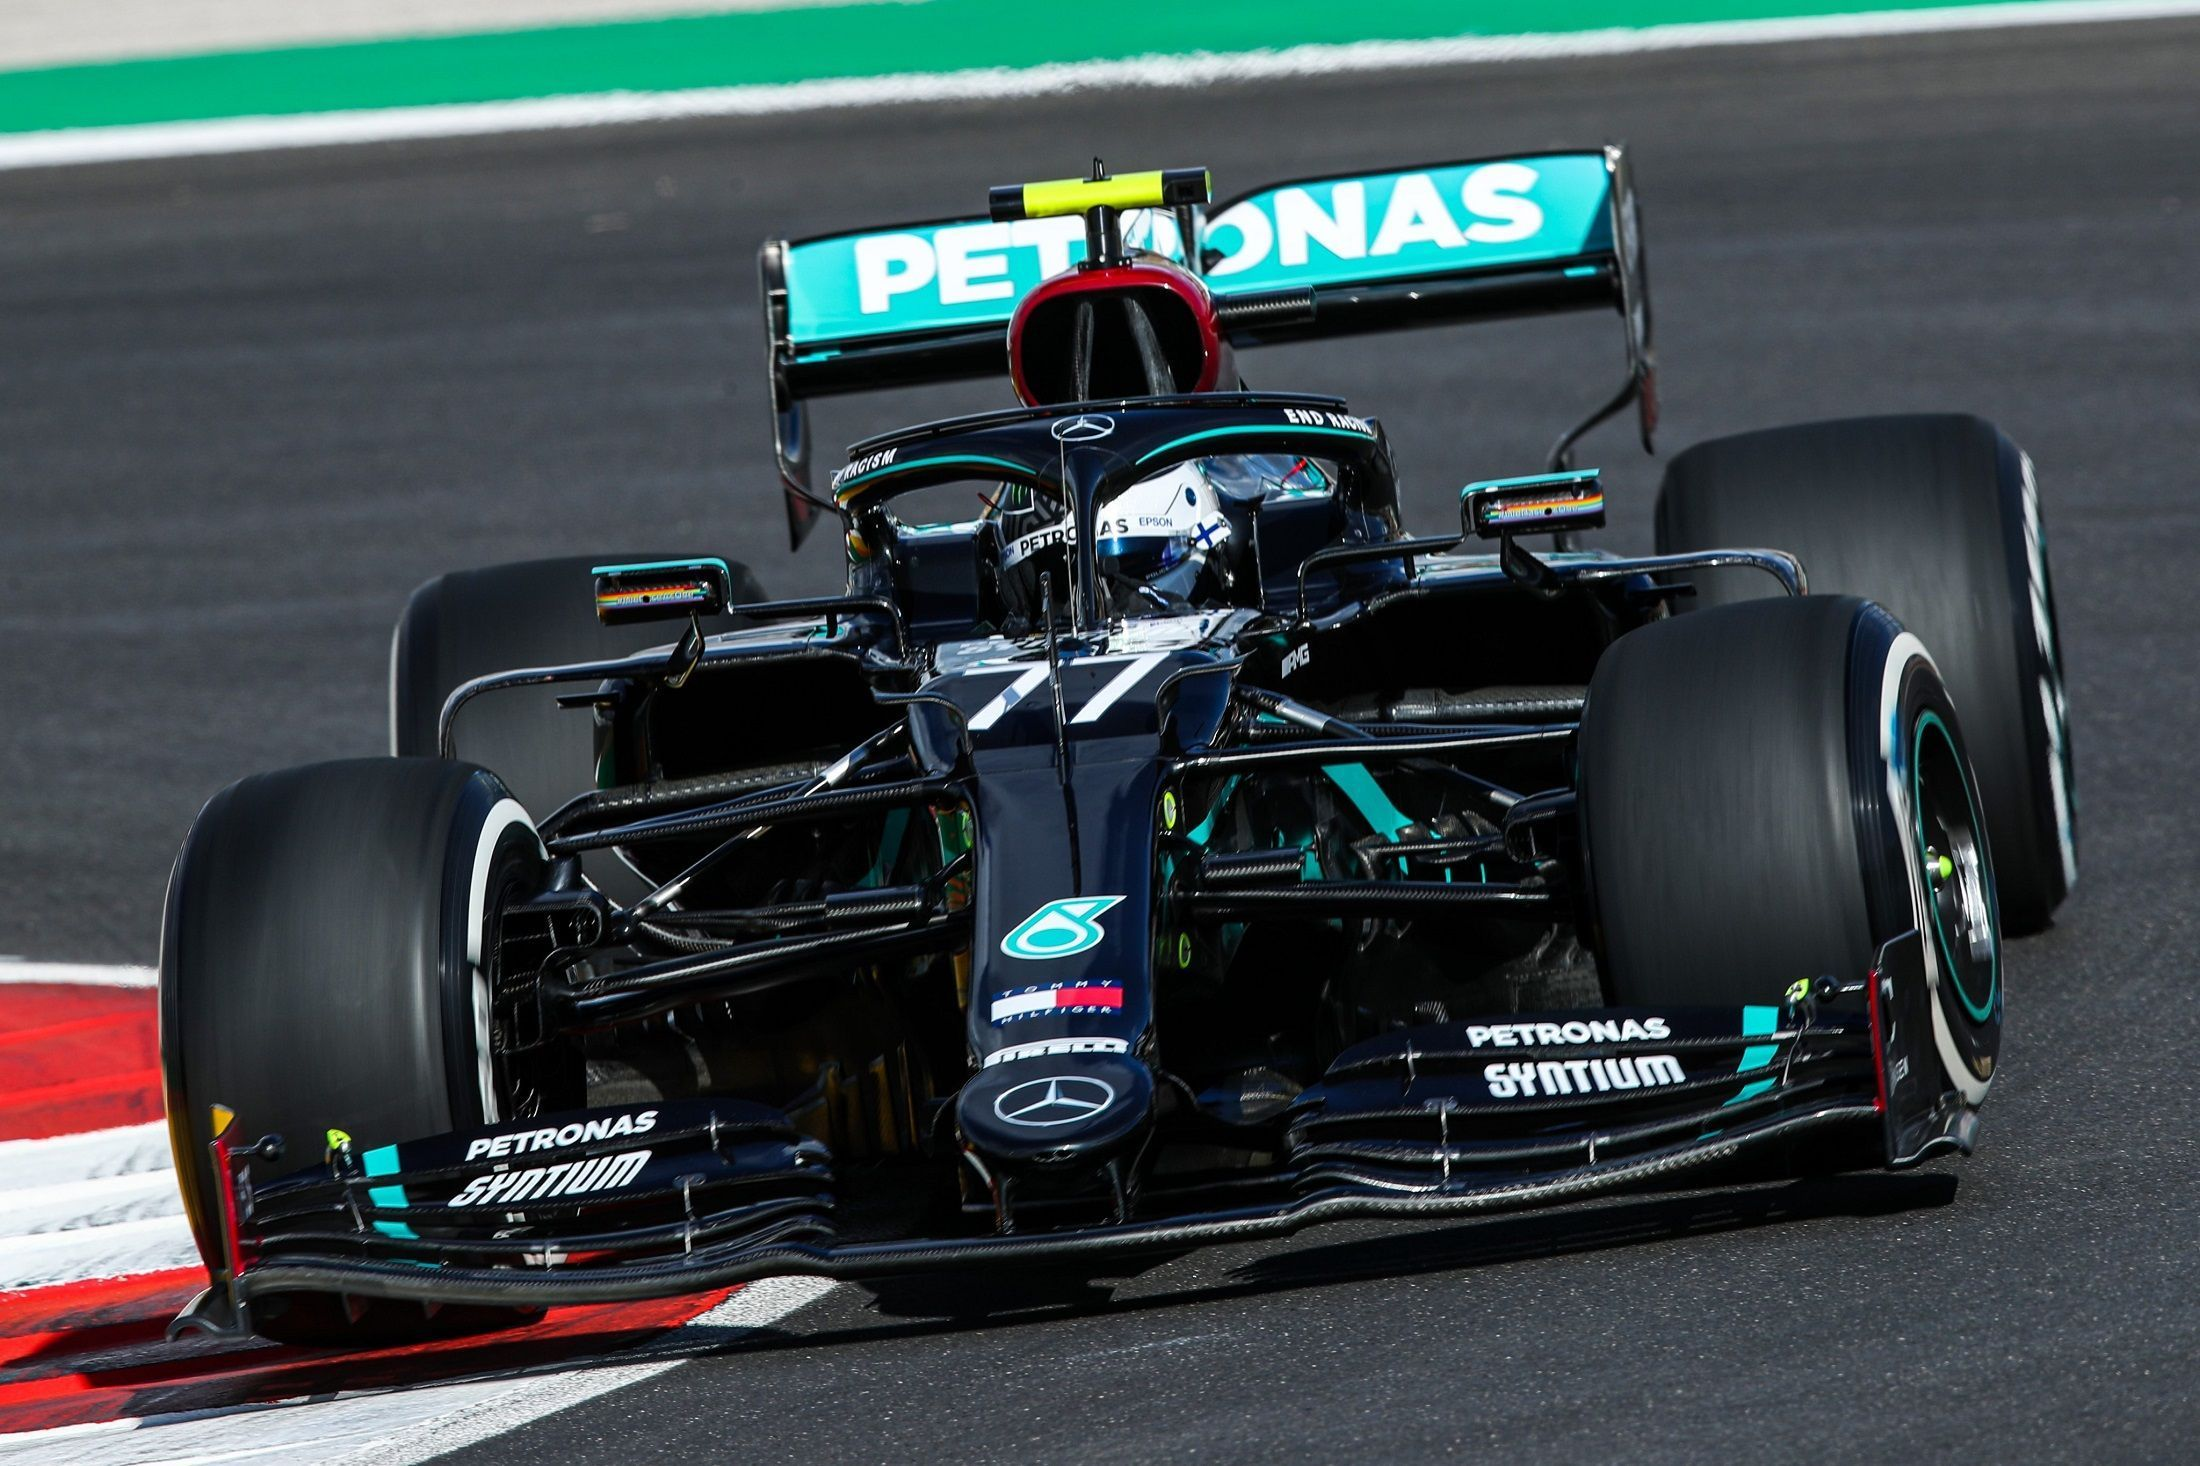 Valtteri Bottas, Portuguese GP